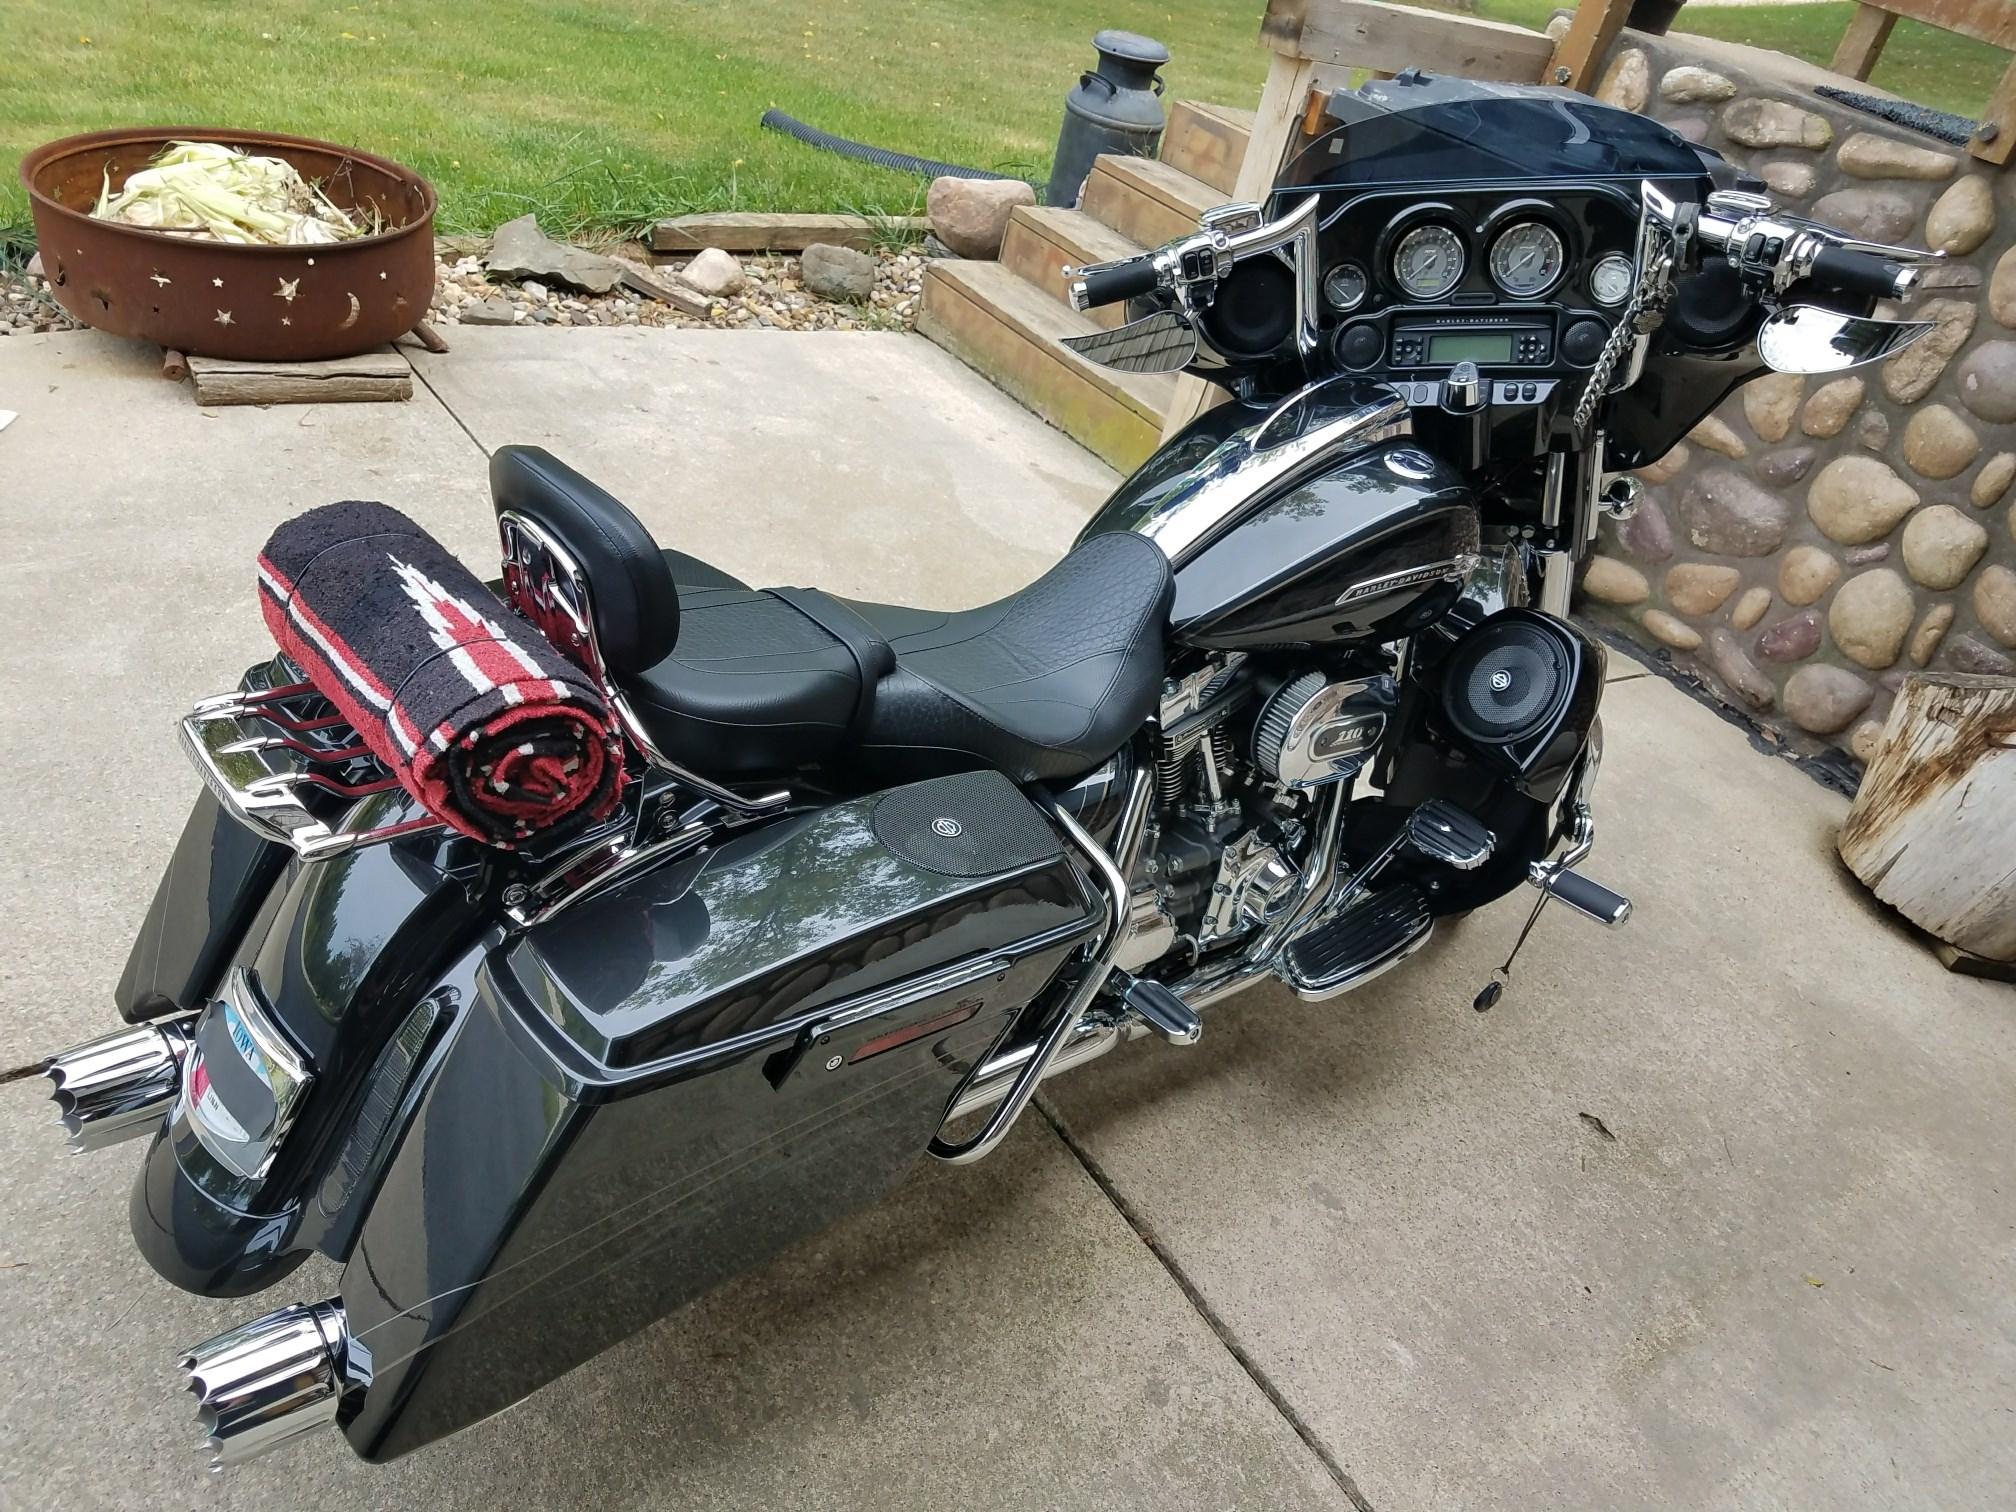 2012 Harley Davidson 174 Flhxse3 Cvo Street Glide 174 Slate